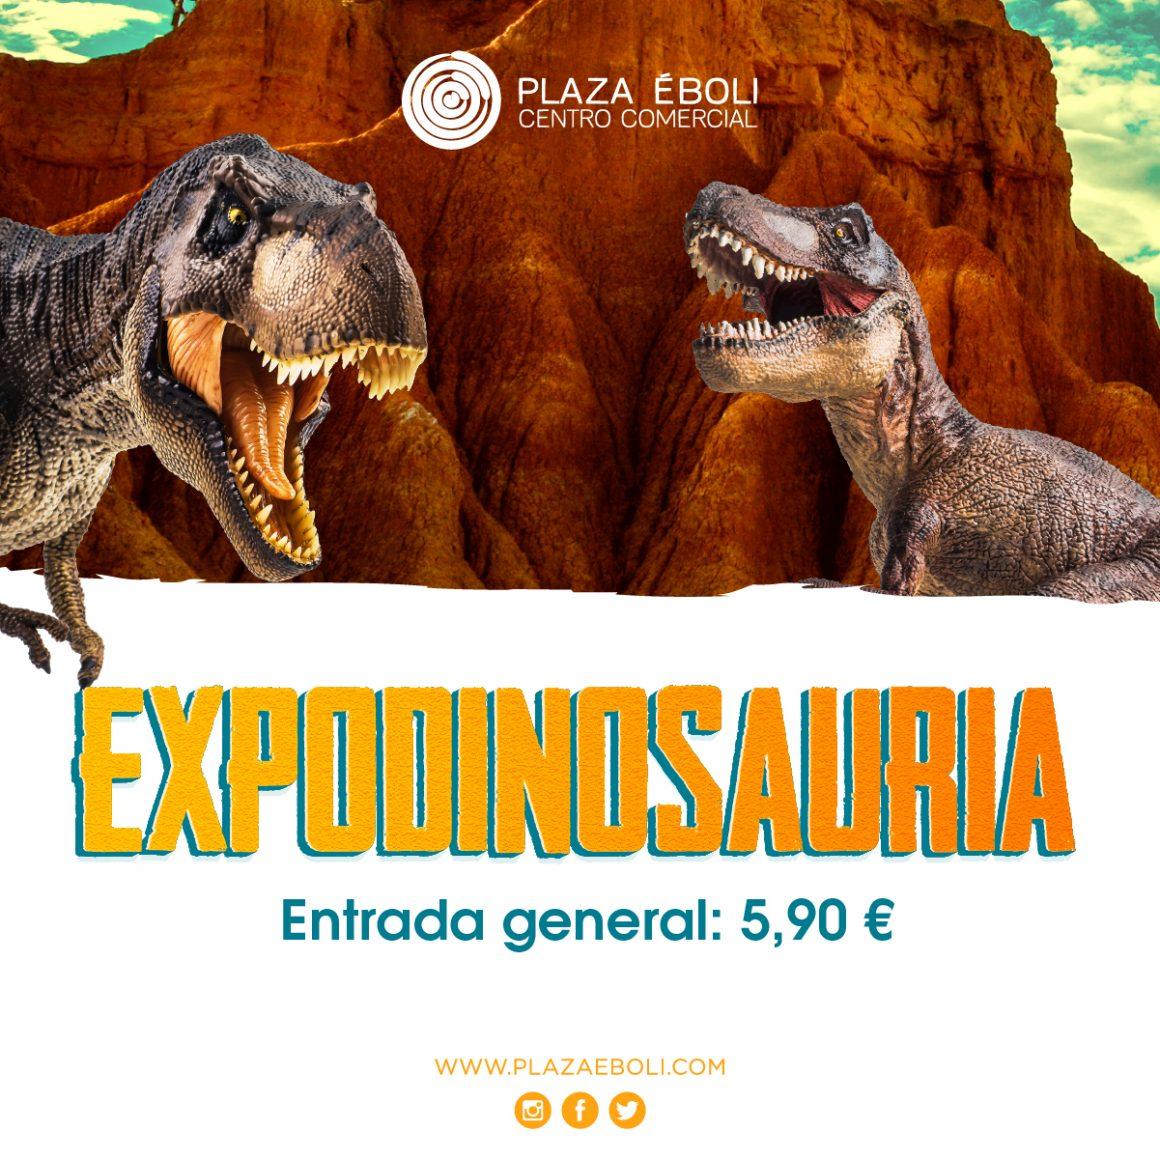 ¡Expodinosauria ha llegado a Plaza Éboli!